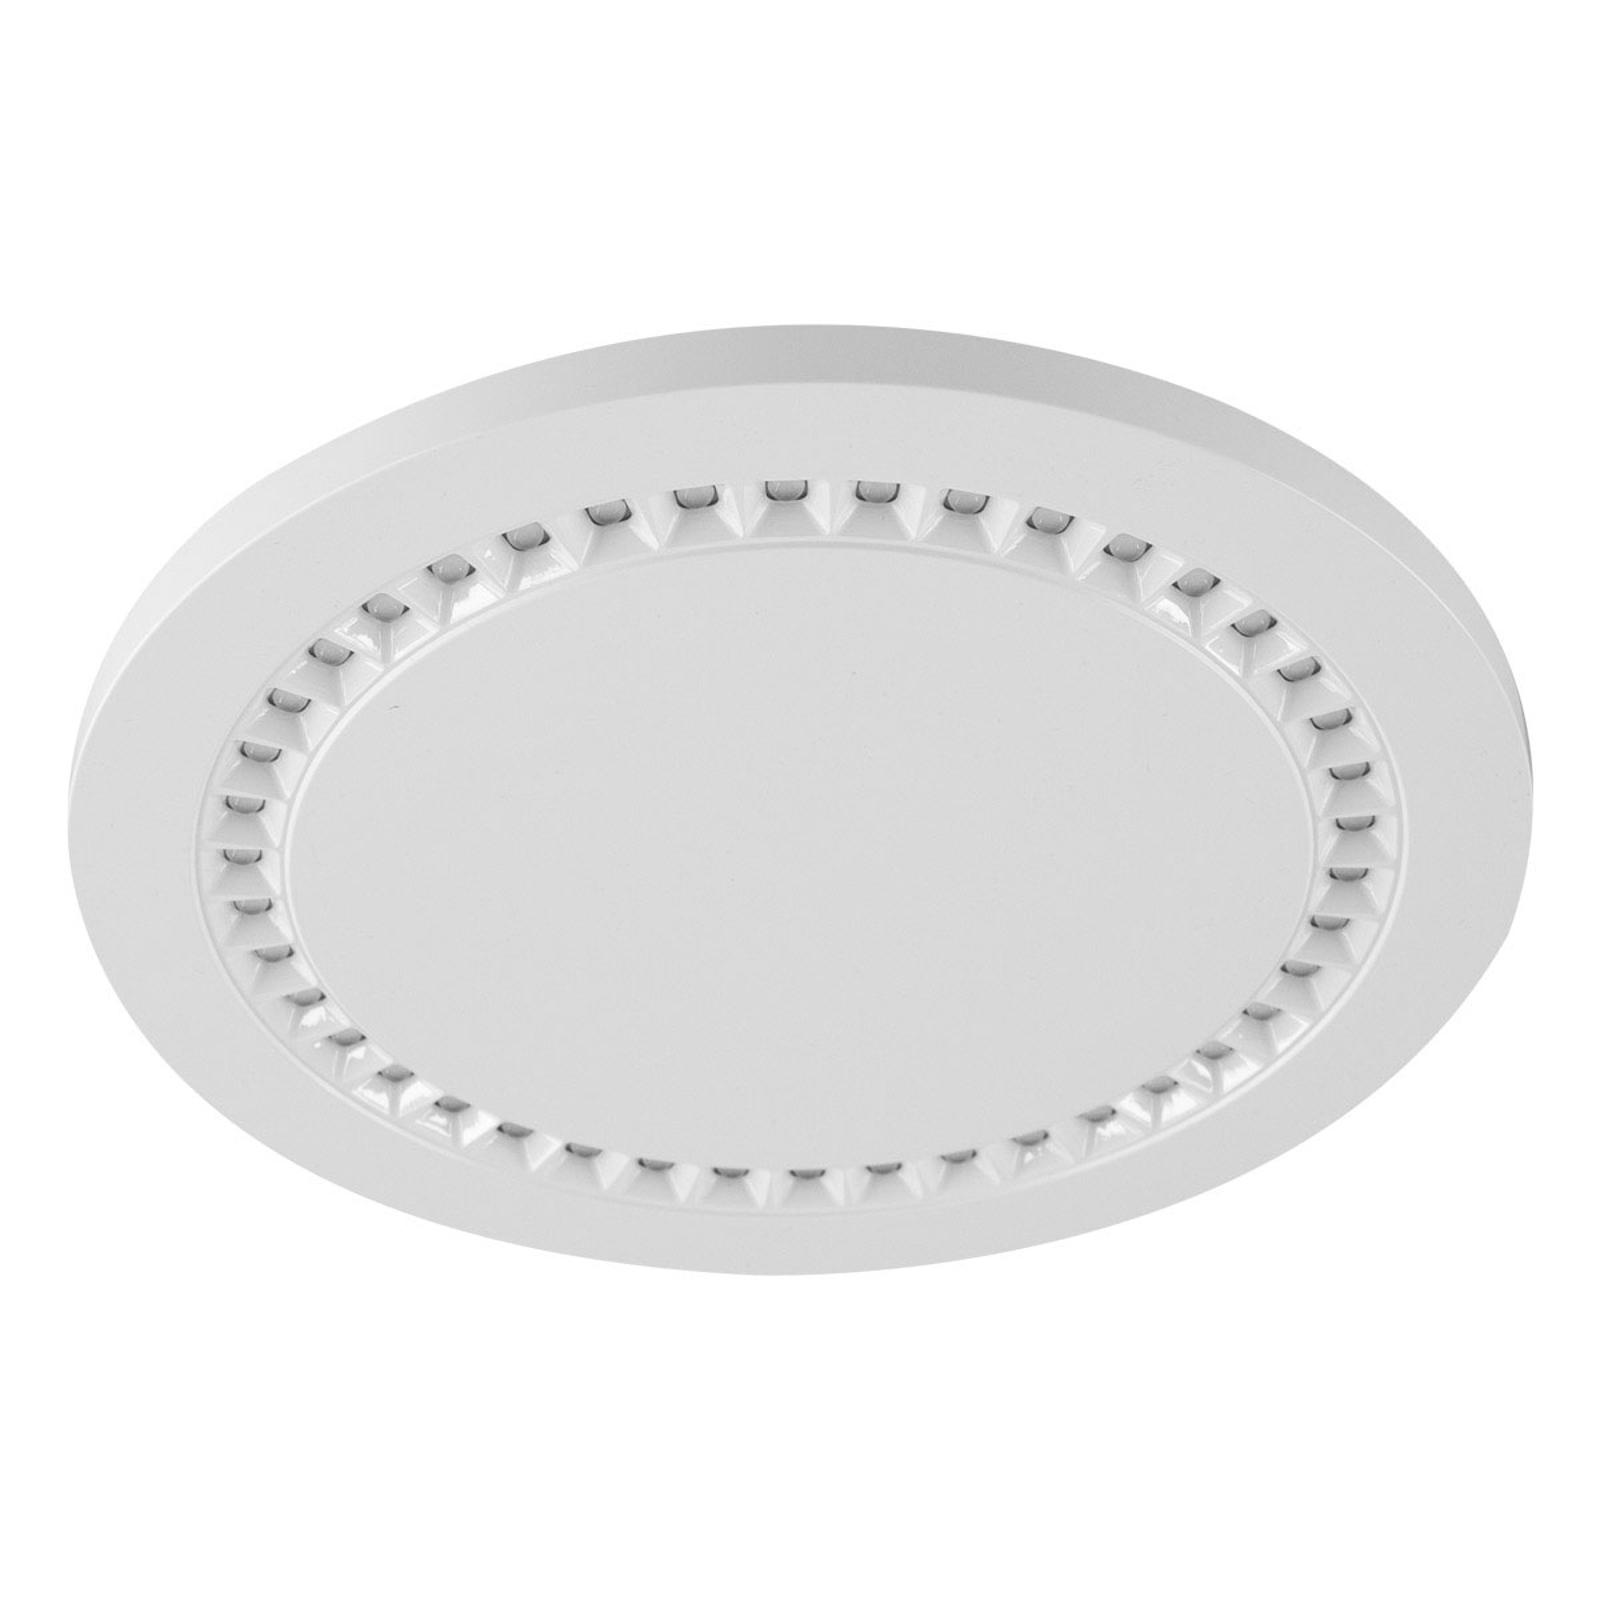 EVN ALR LED-Panel weiß 15W Ø30cm 4.000K